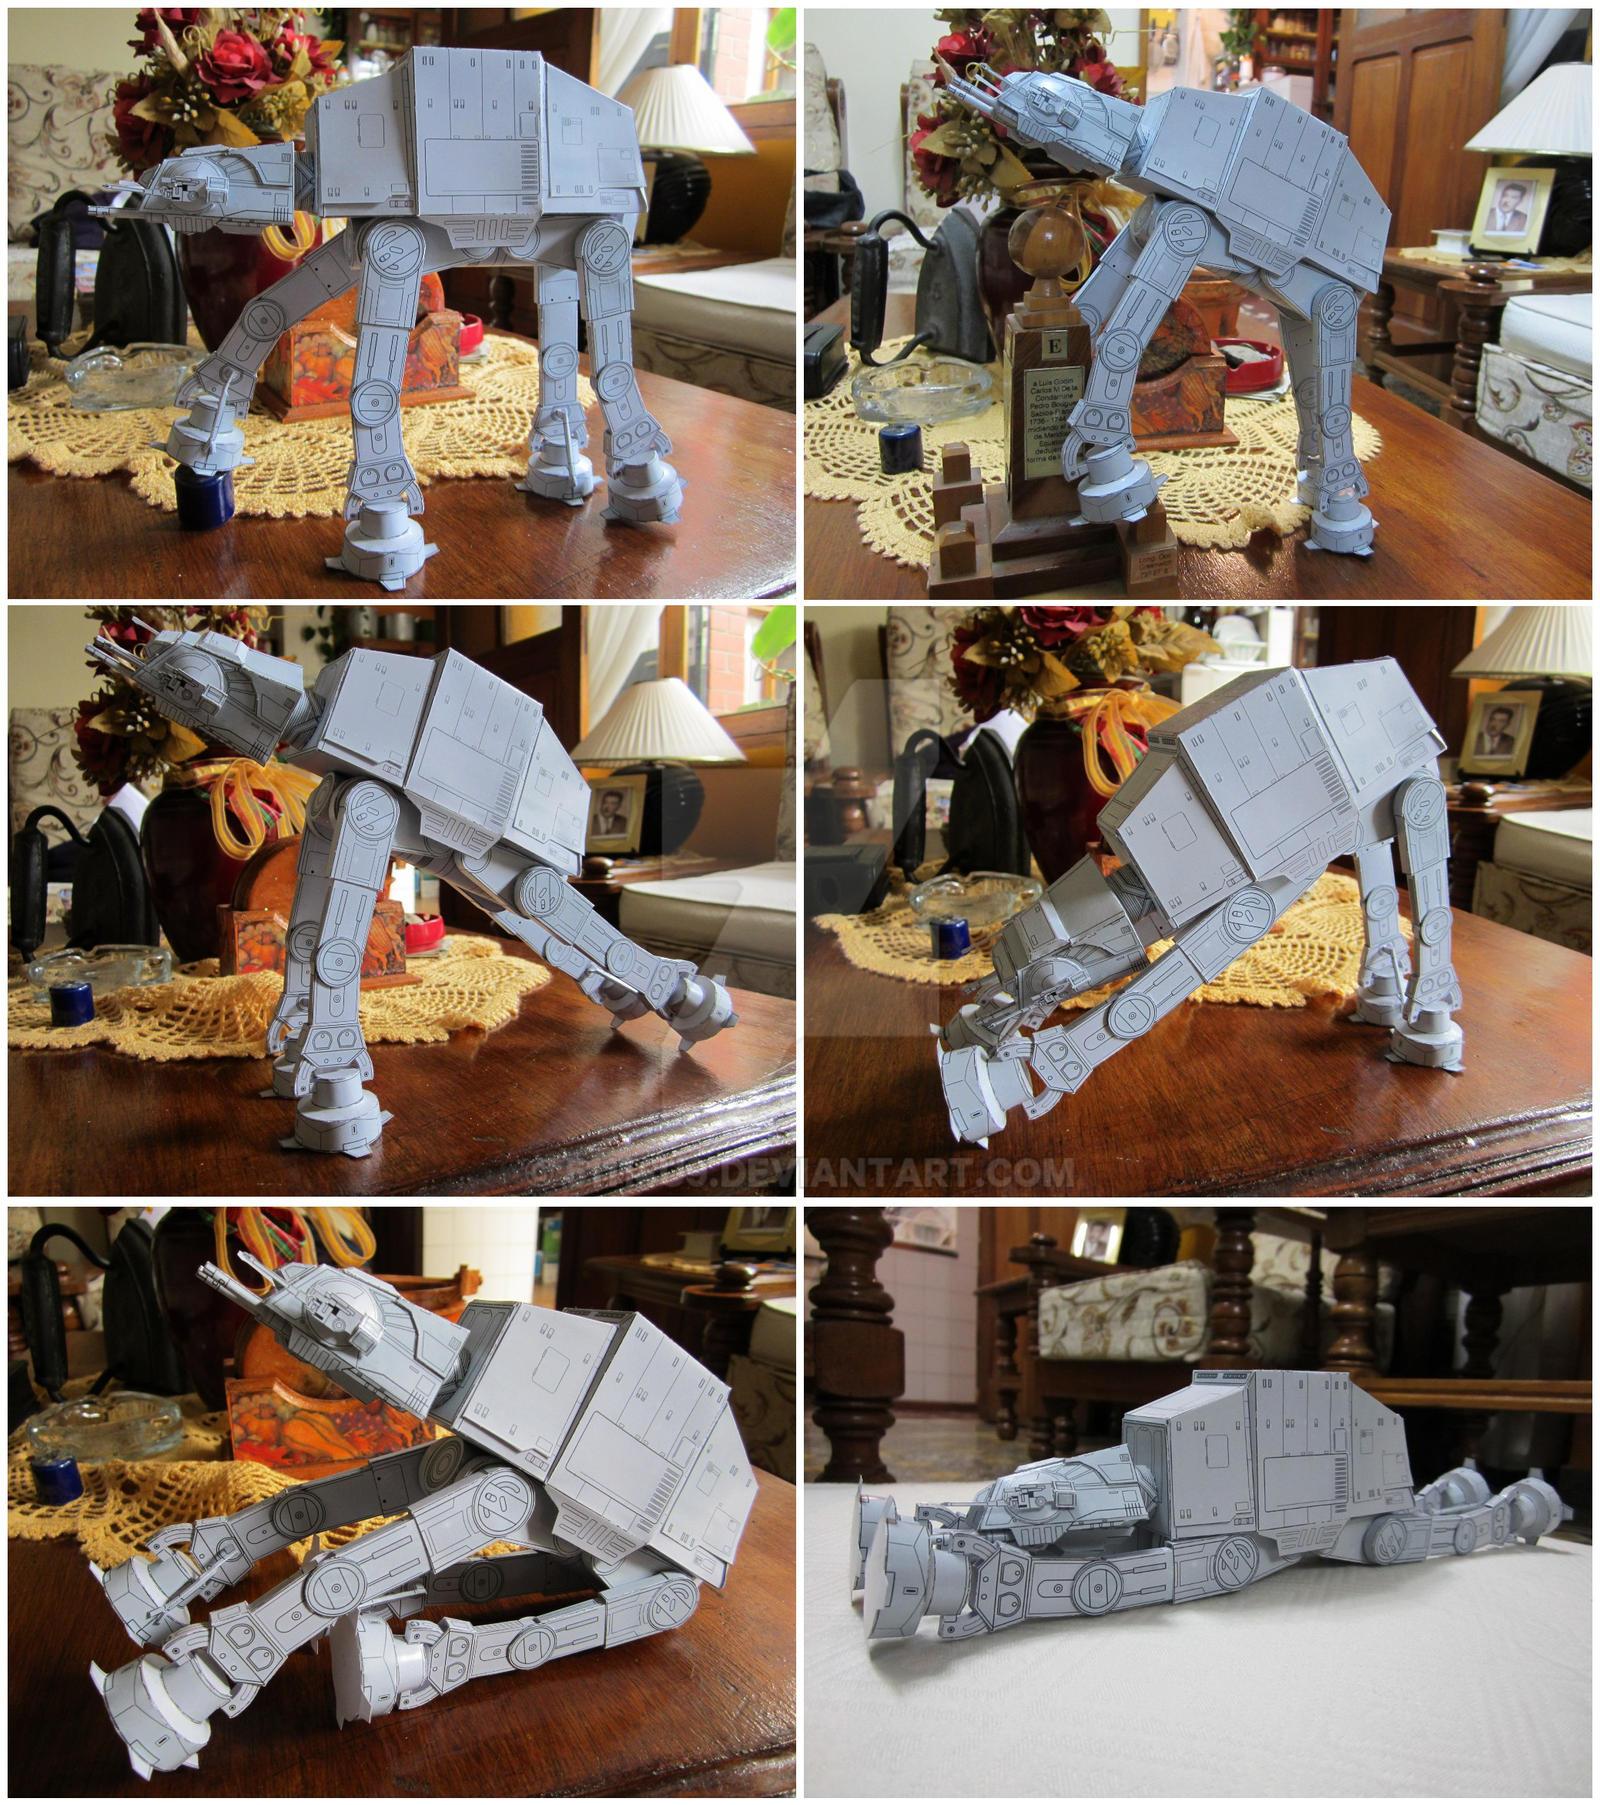 Papercraft Star Wars At At By 51114u9 On Deviantart